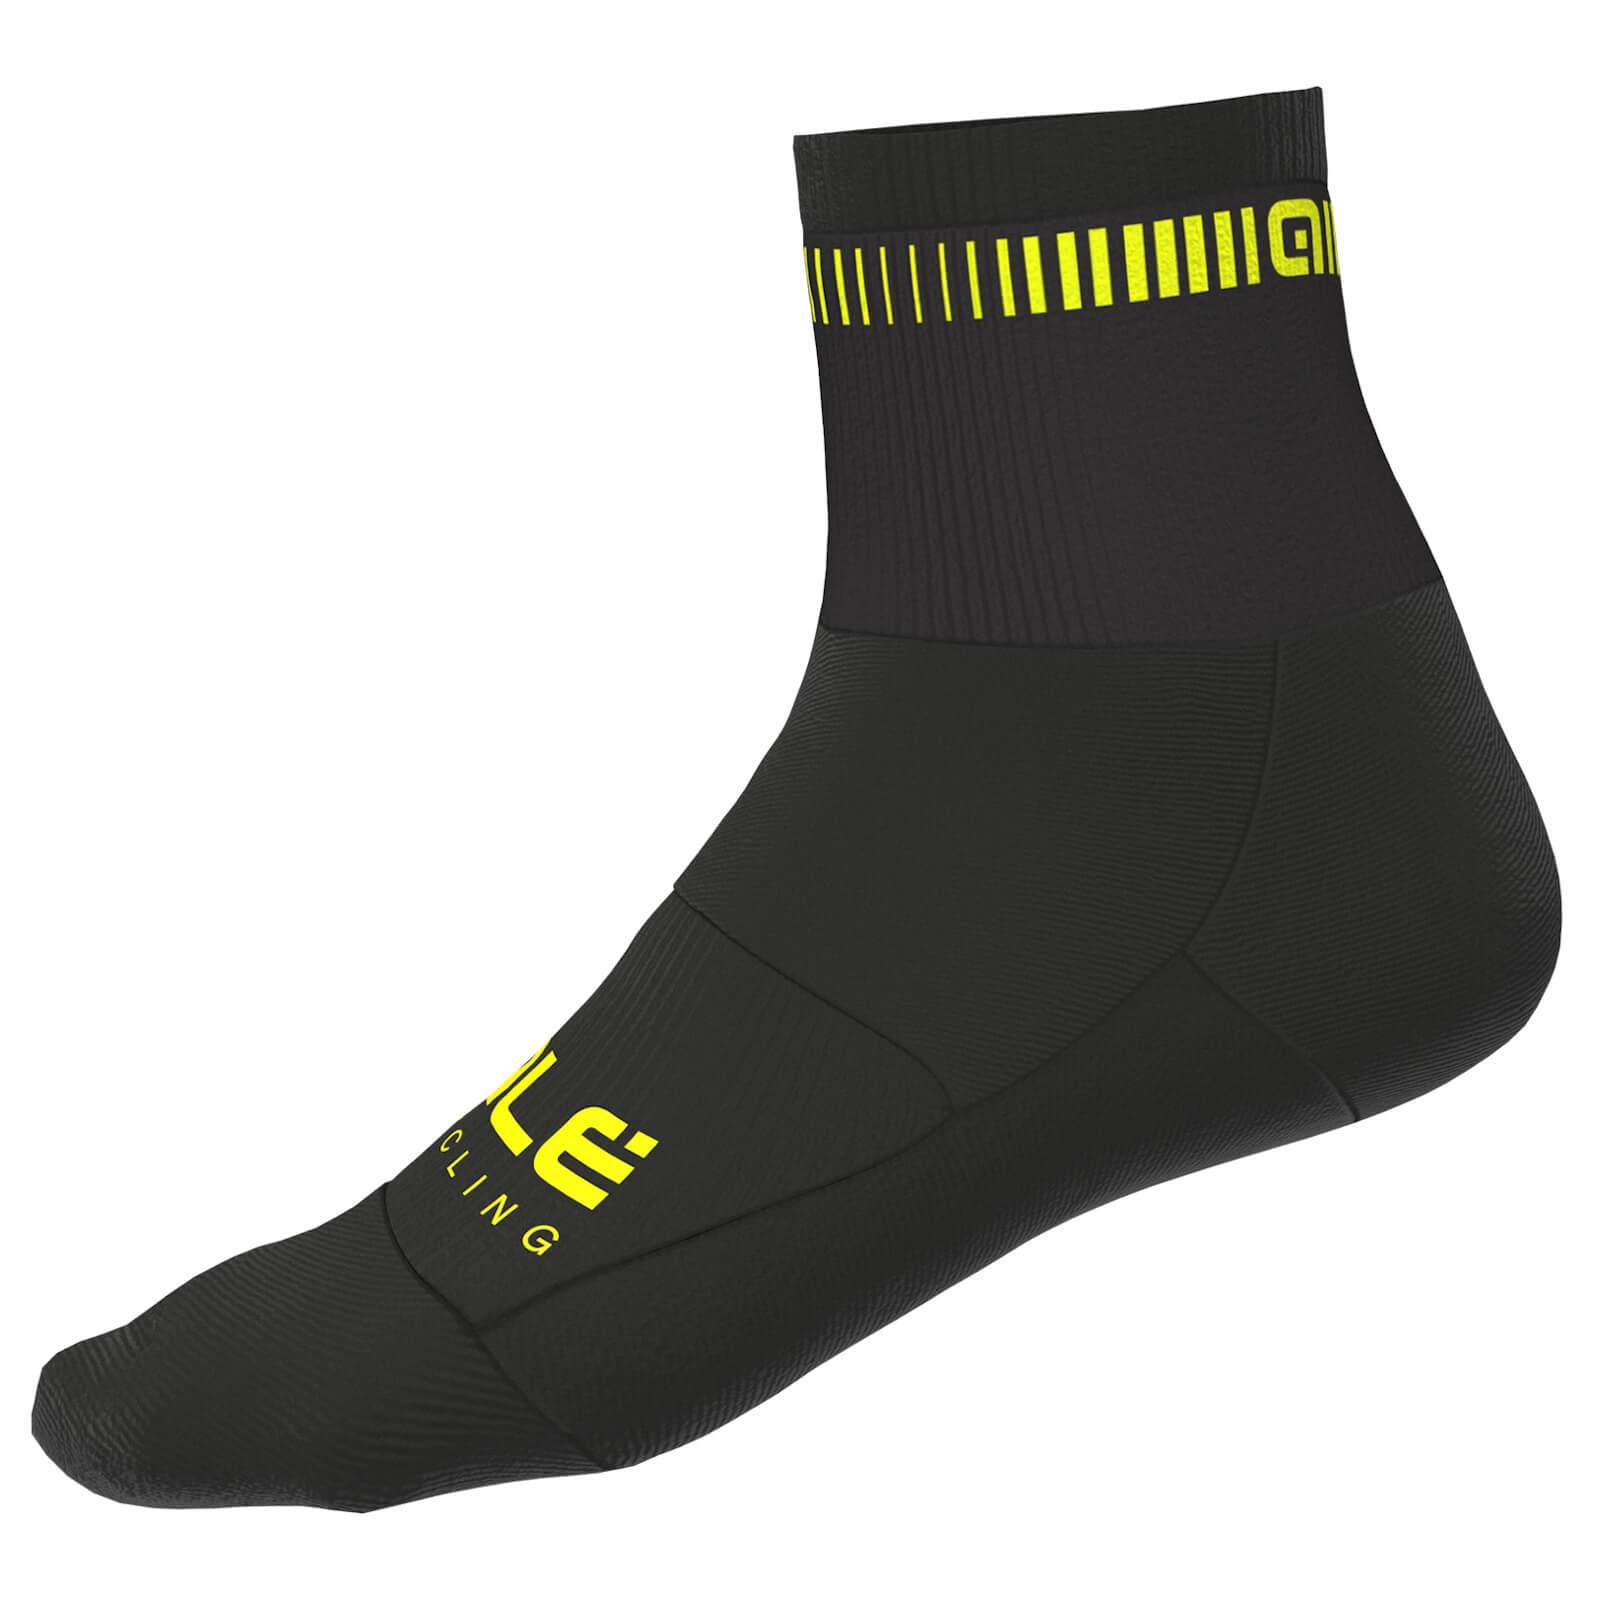 Al Chrono Gloves - Yellow/black - L - Yellow/black